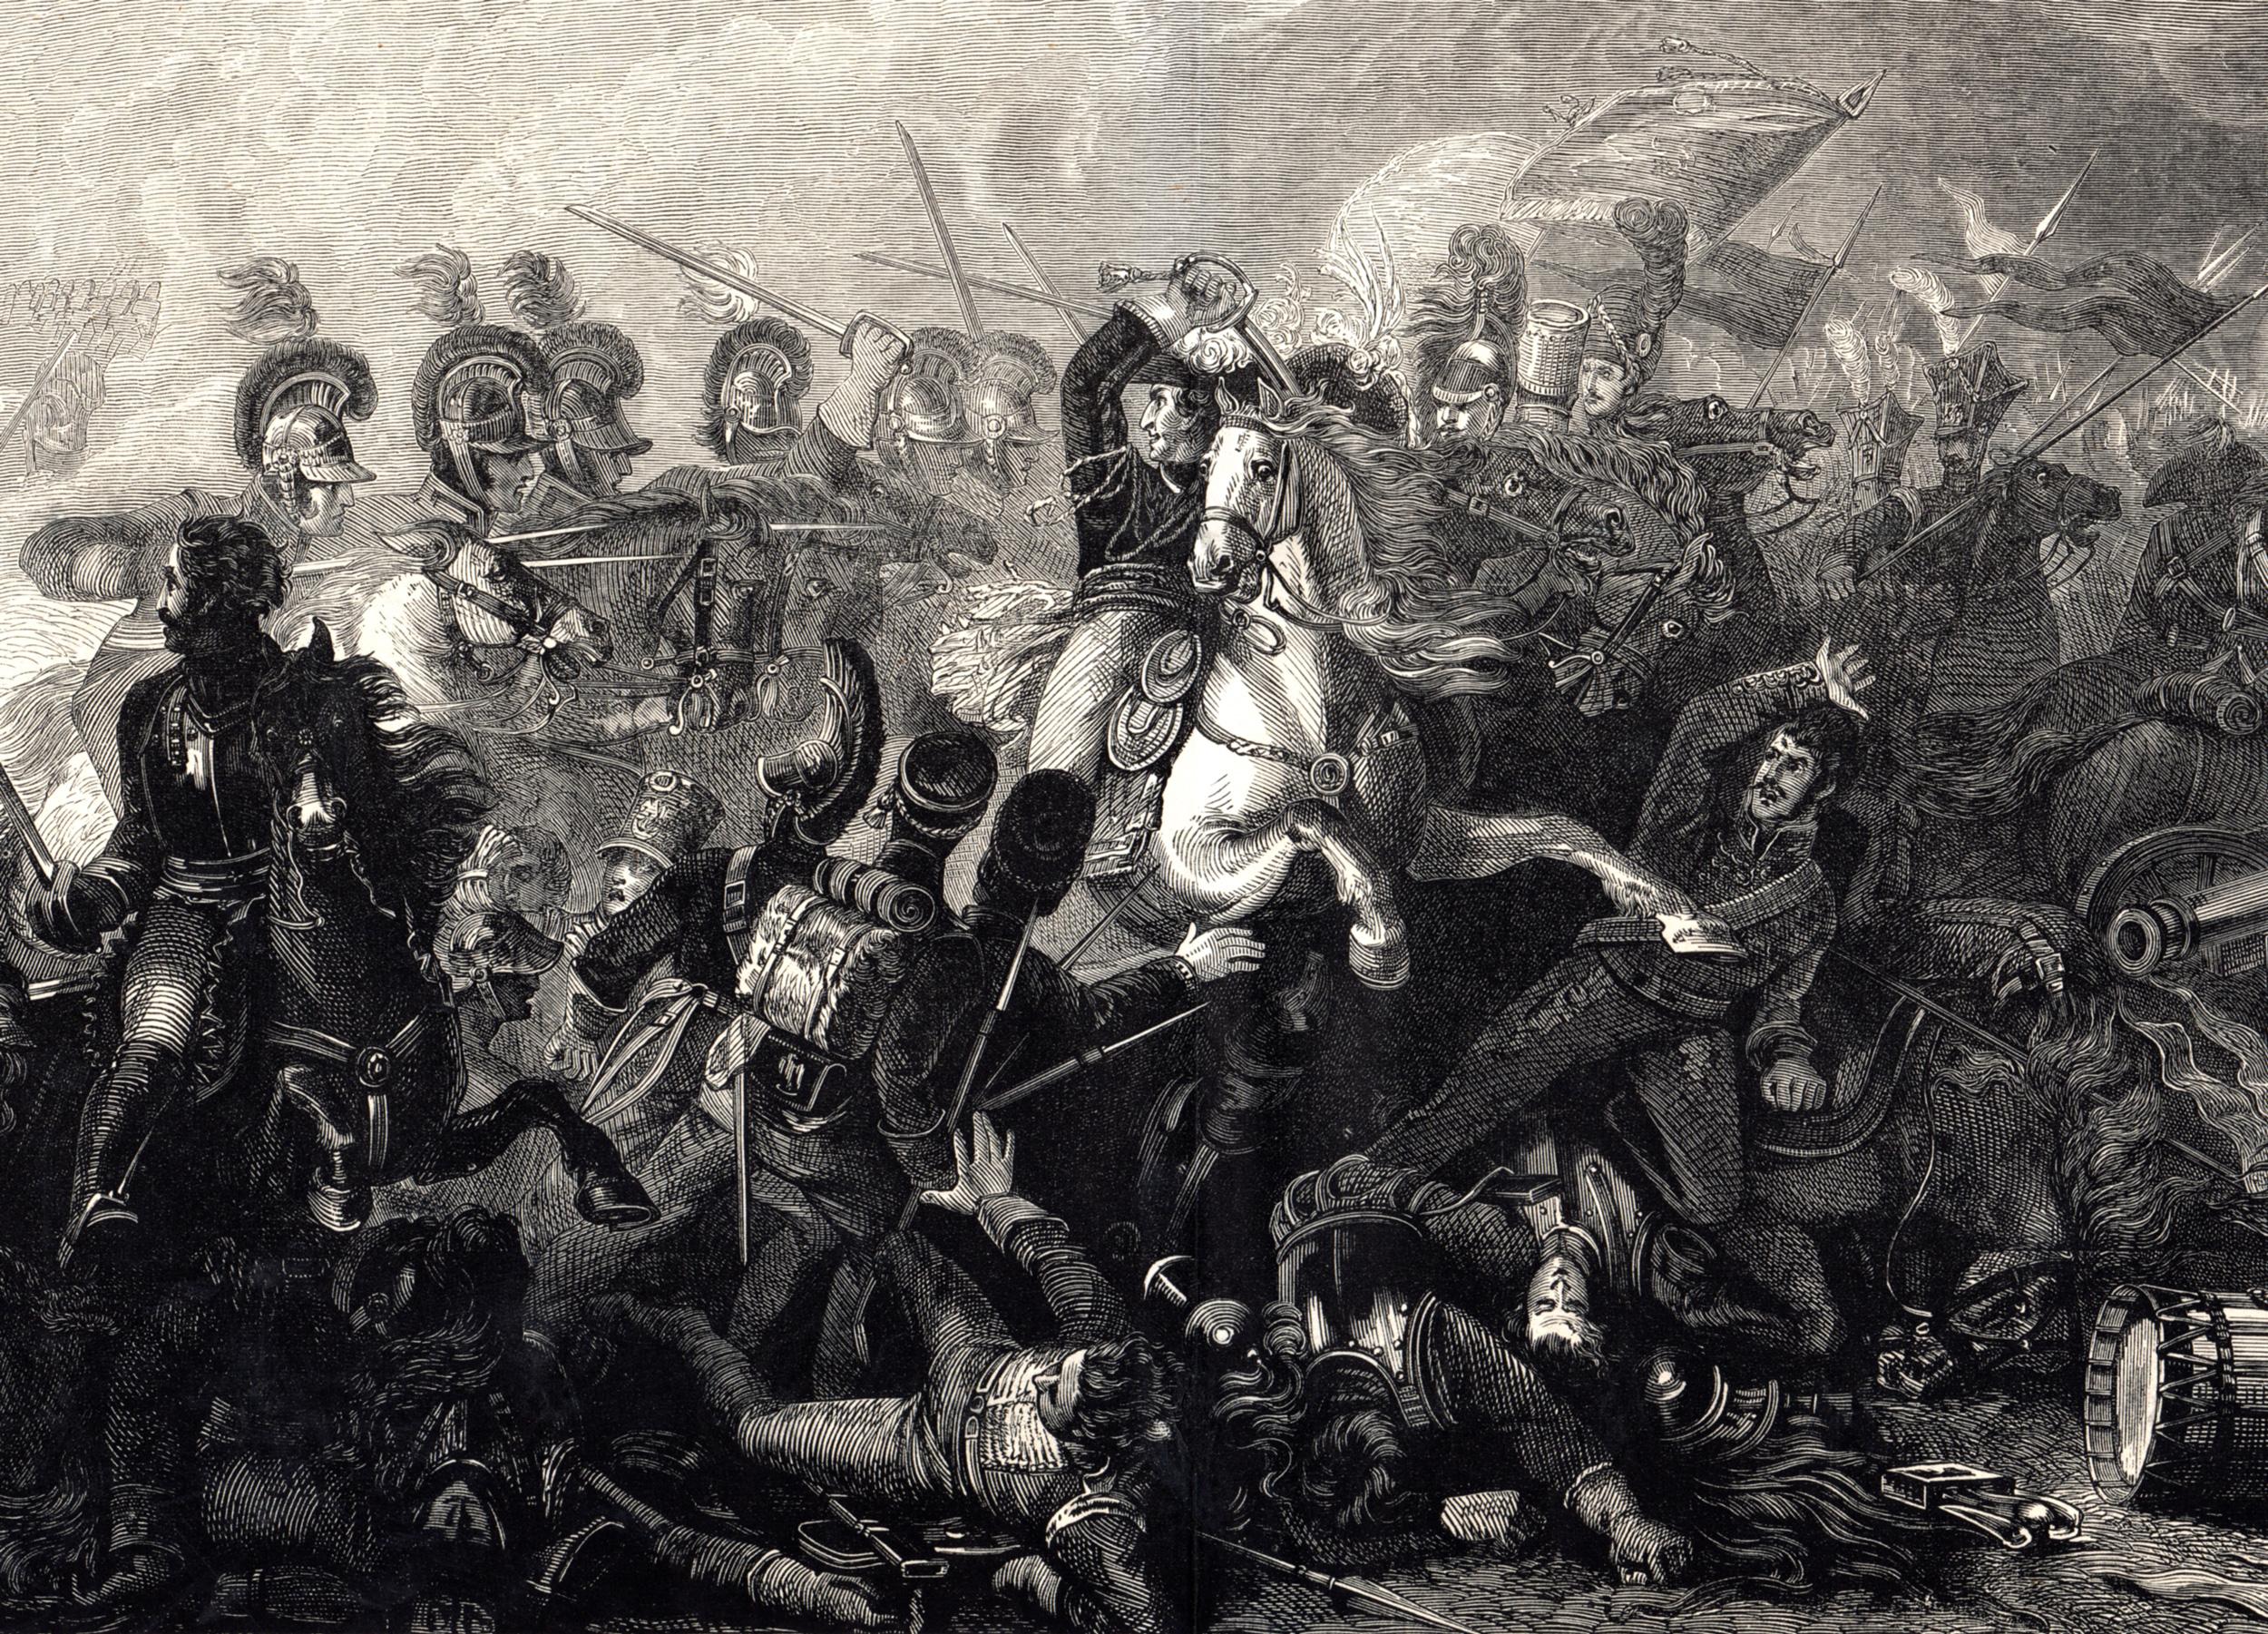 Battle prints